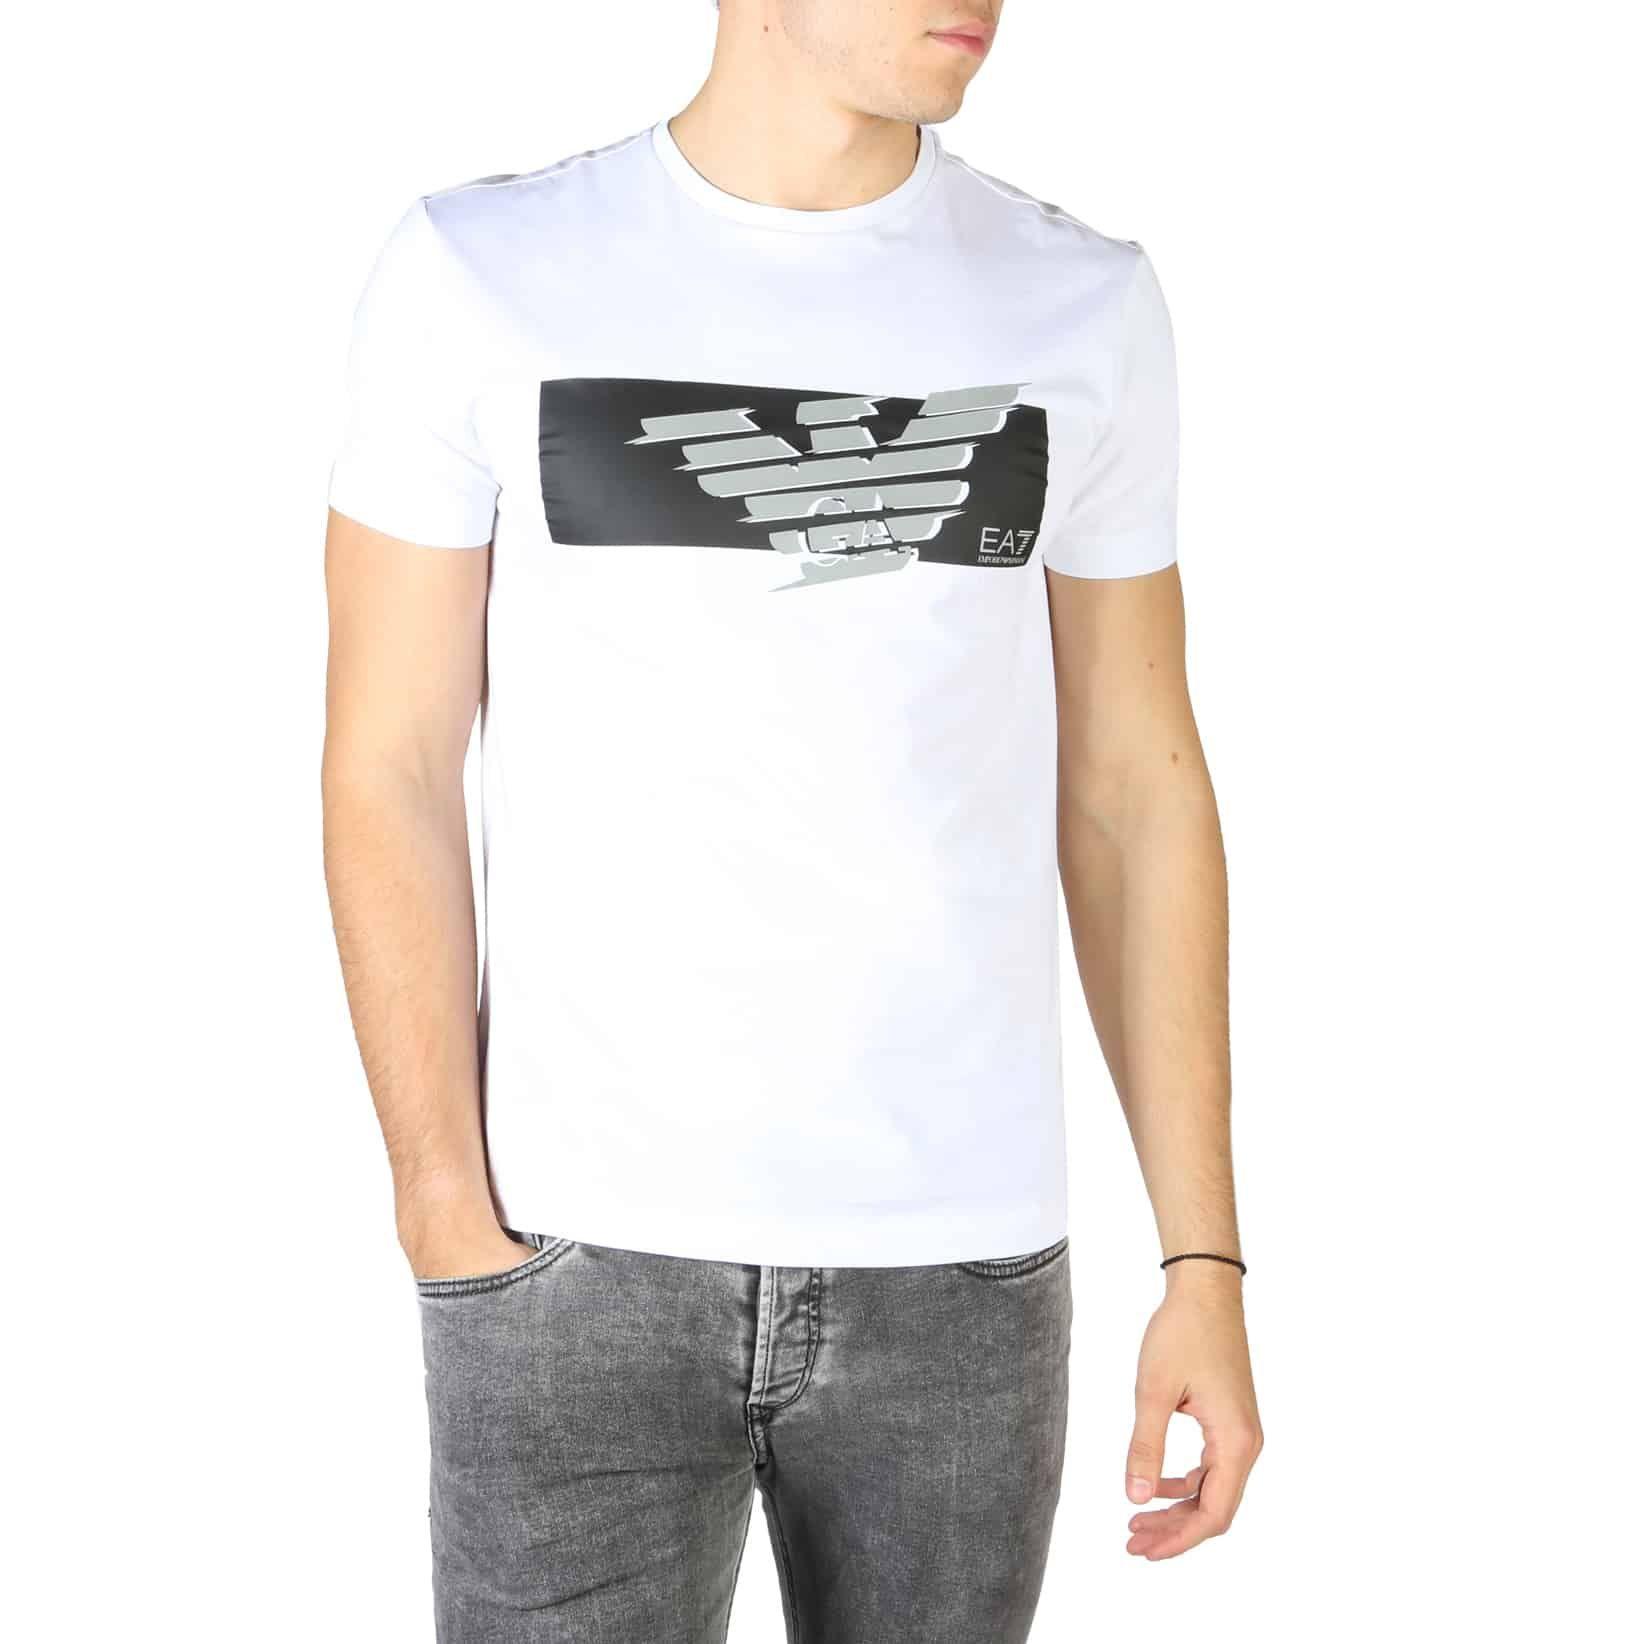 EA7 – 3HPT48 Man T-shirt